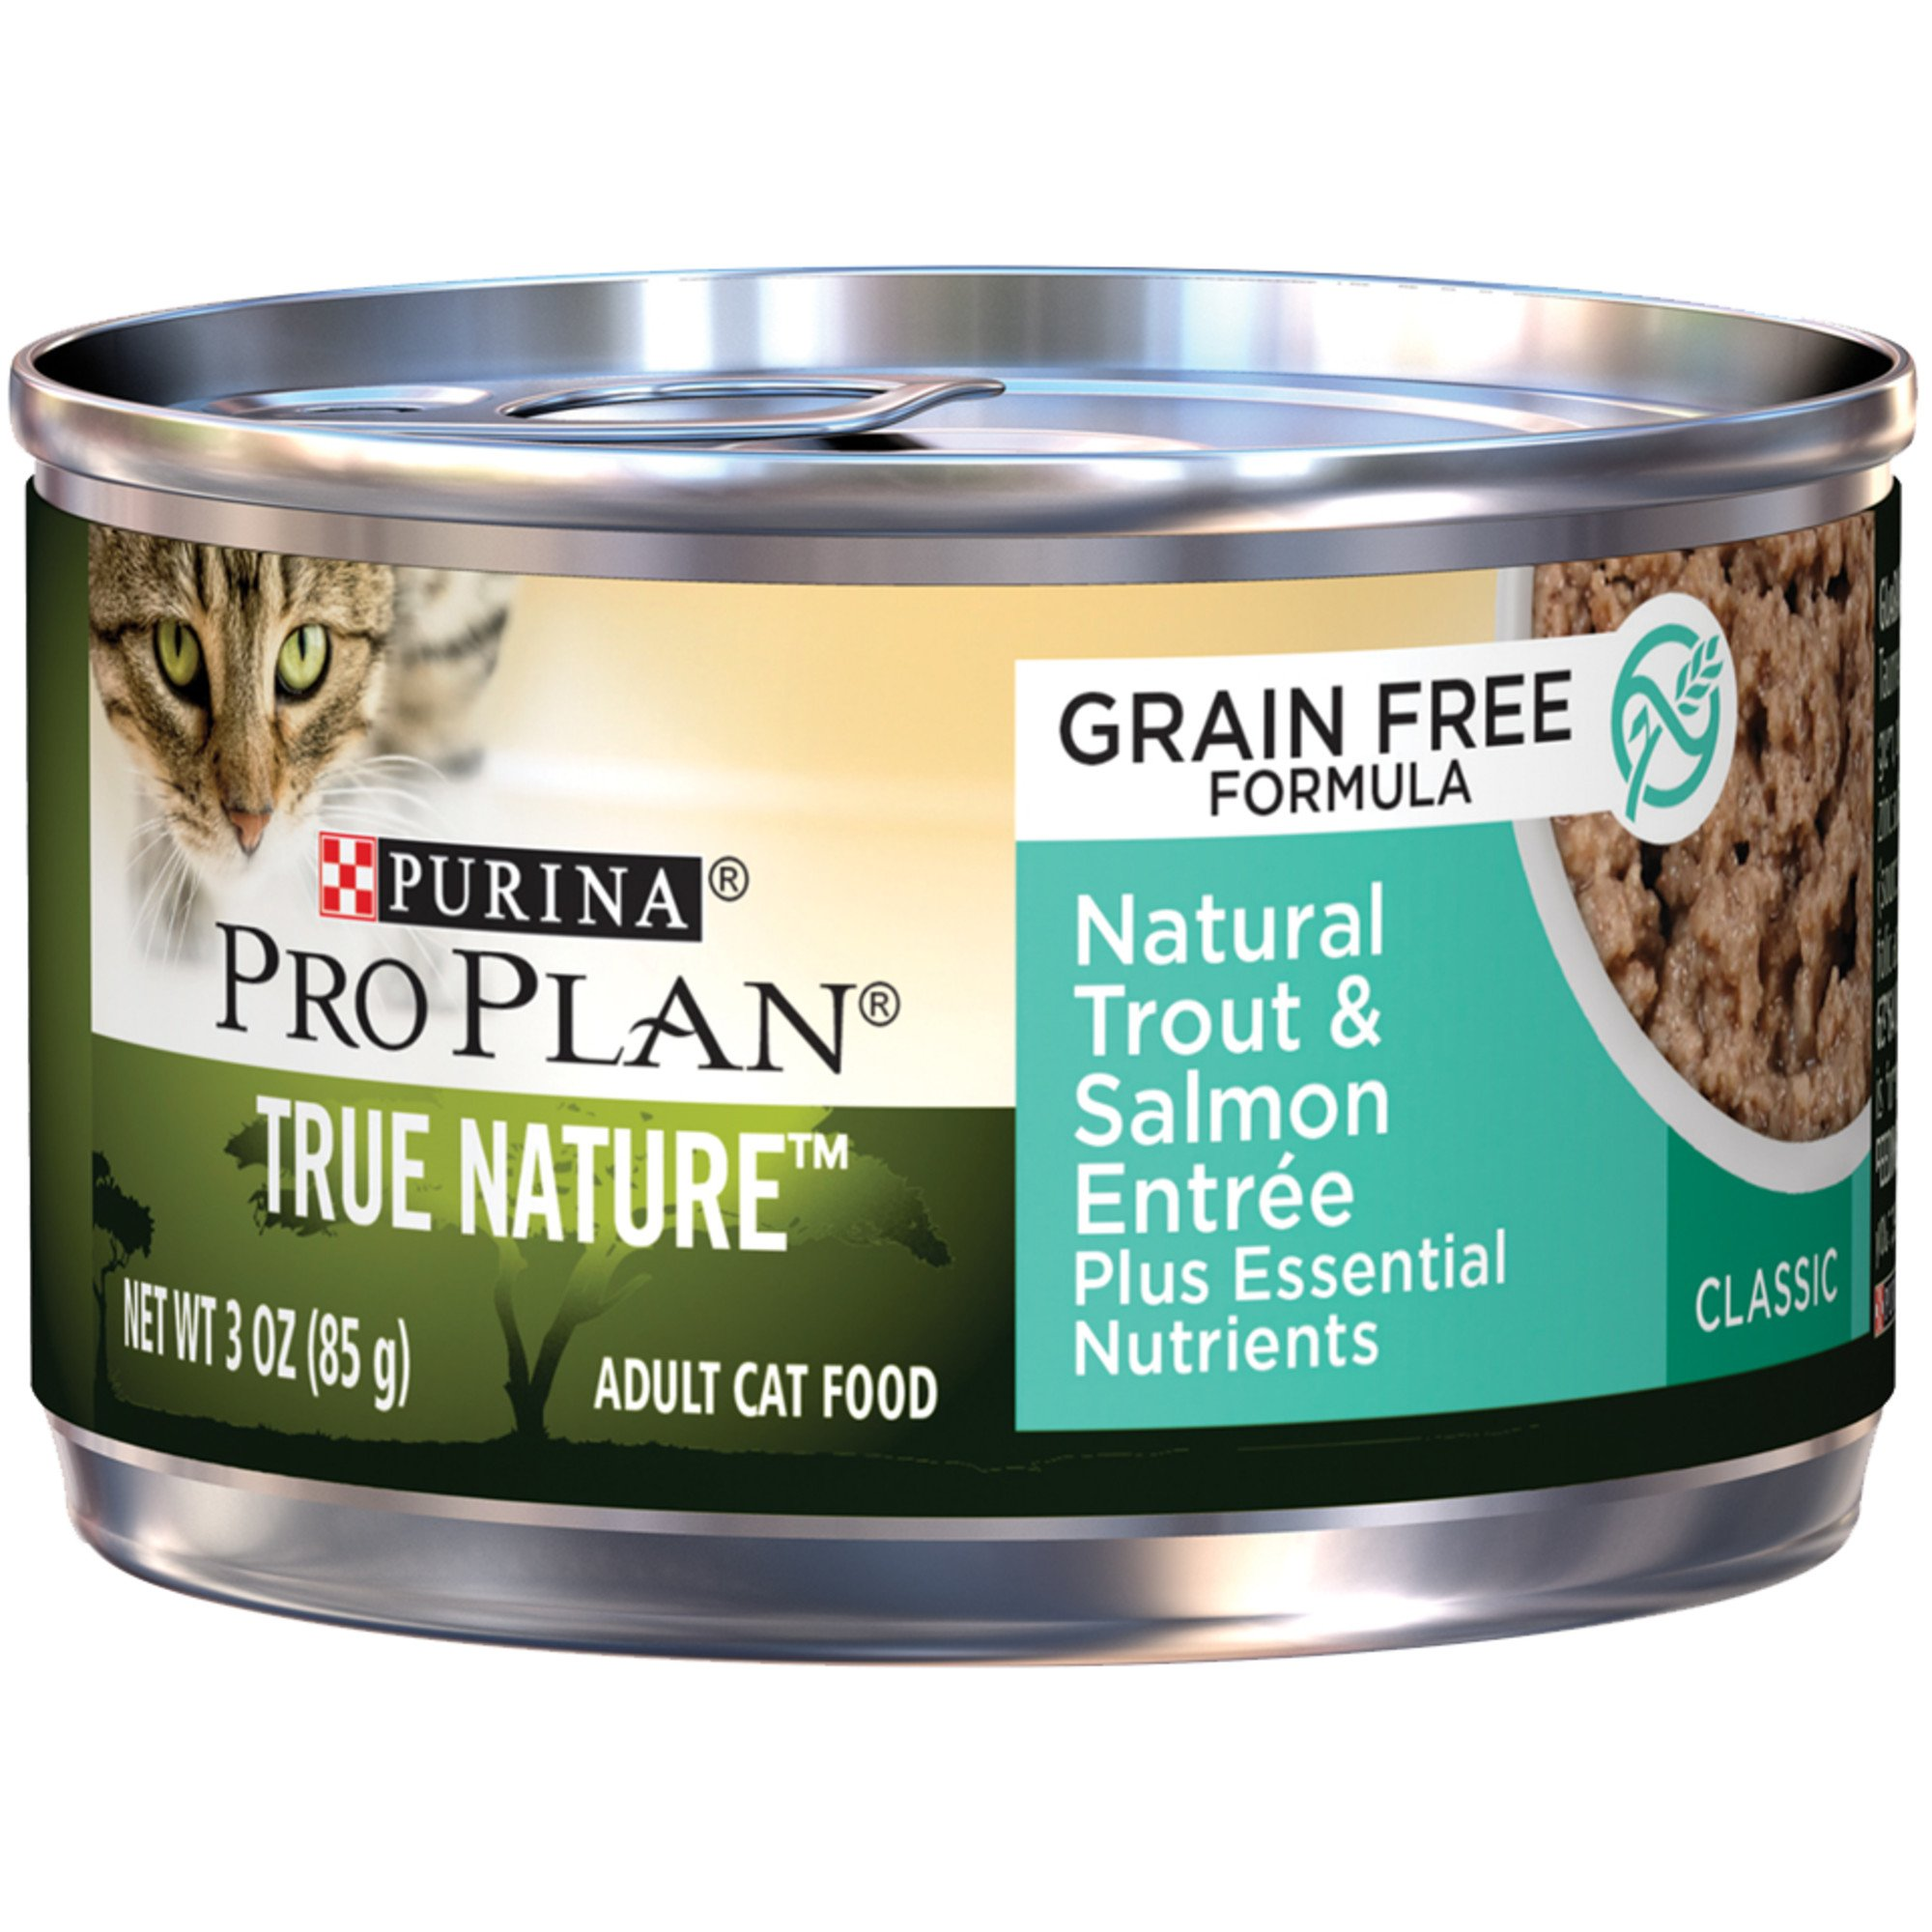 Pro Nature Dog Food Price